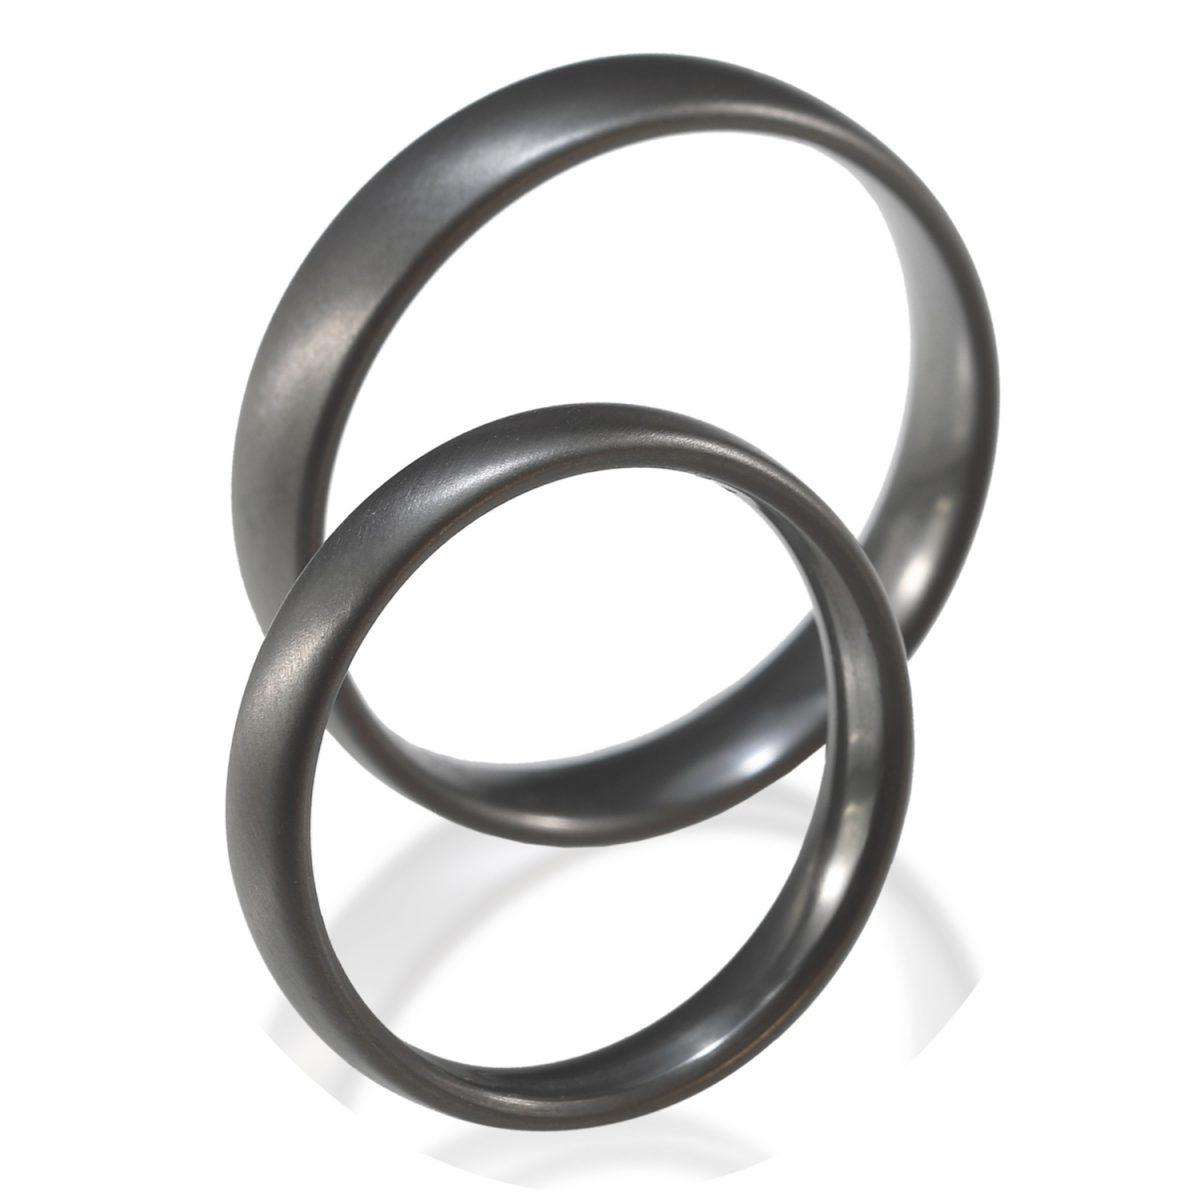 Tantal Hochzeitsringe | Ehering | Ringpaar True Love Collection No:5